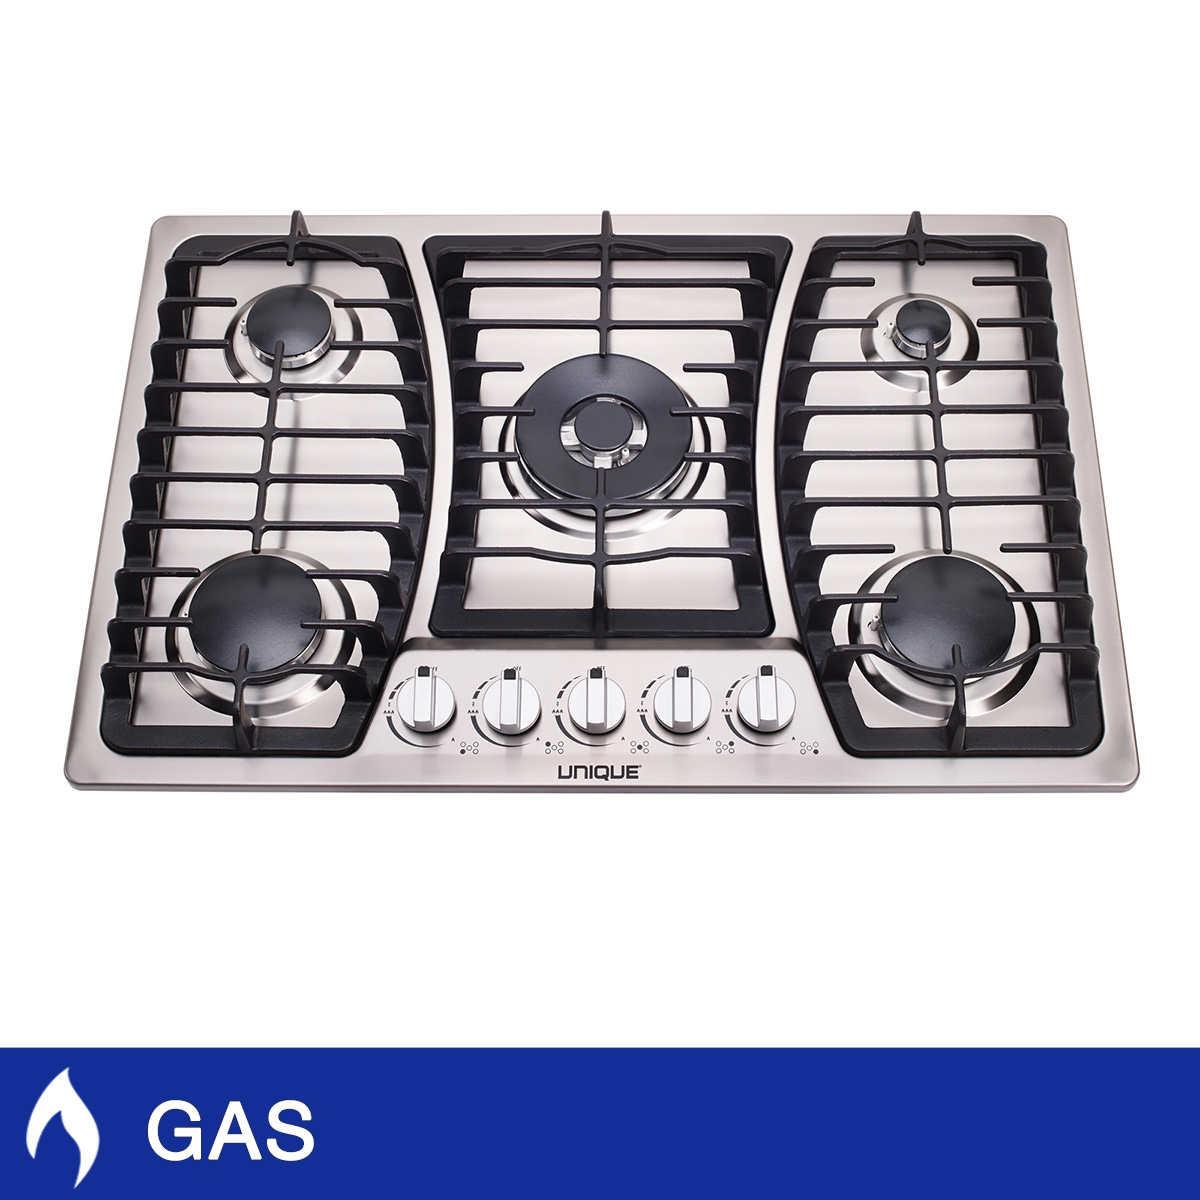 Gas Stove Service Cooktops Costco